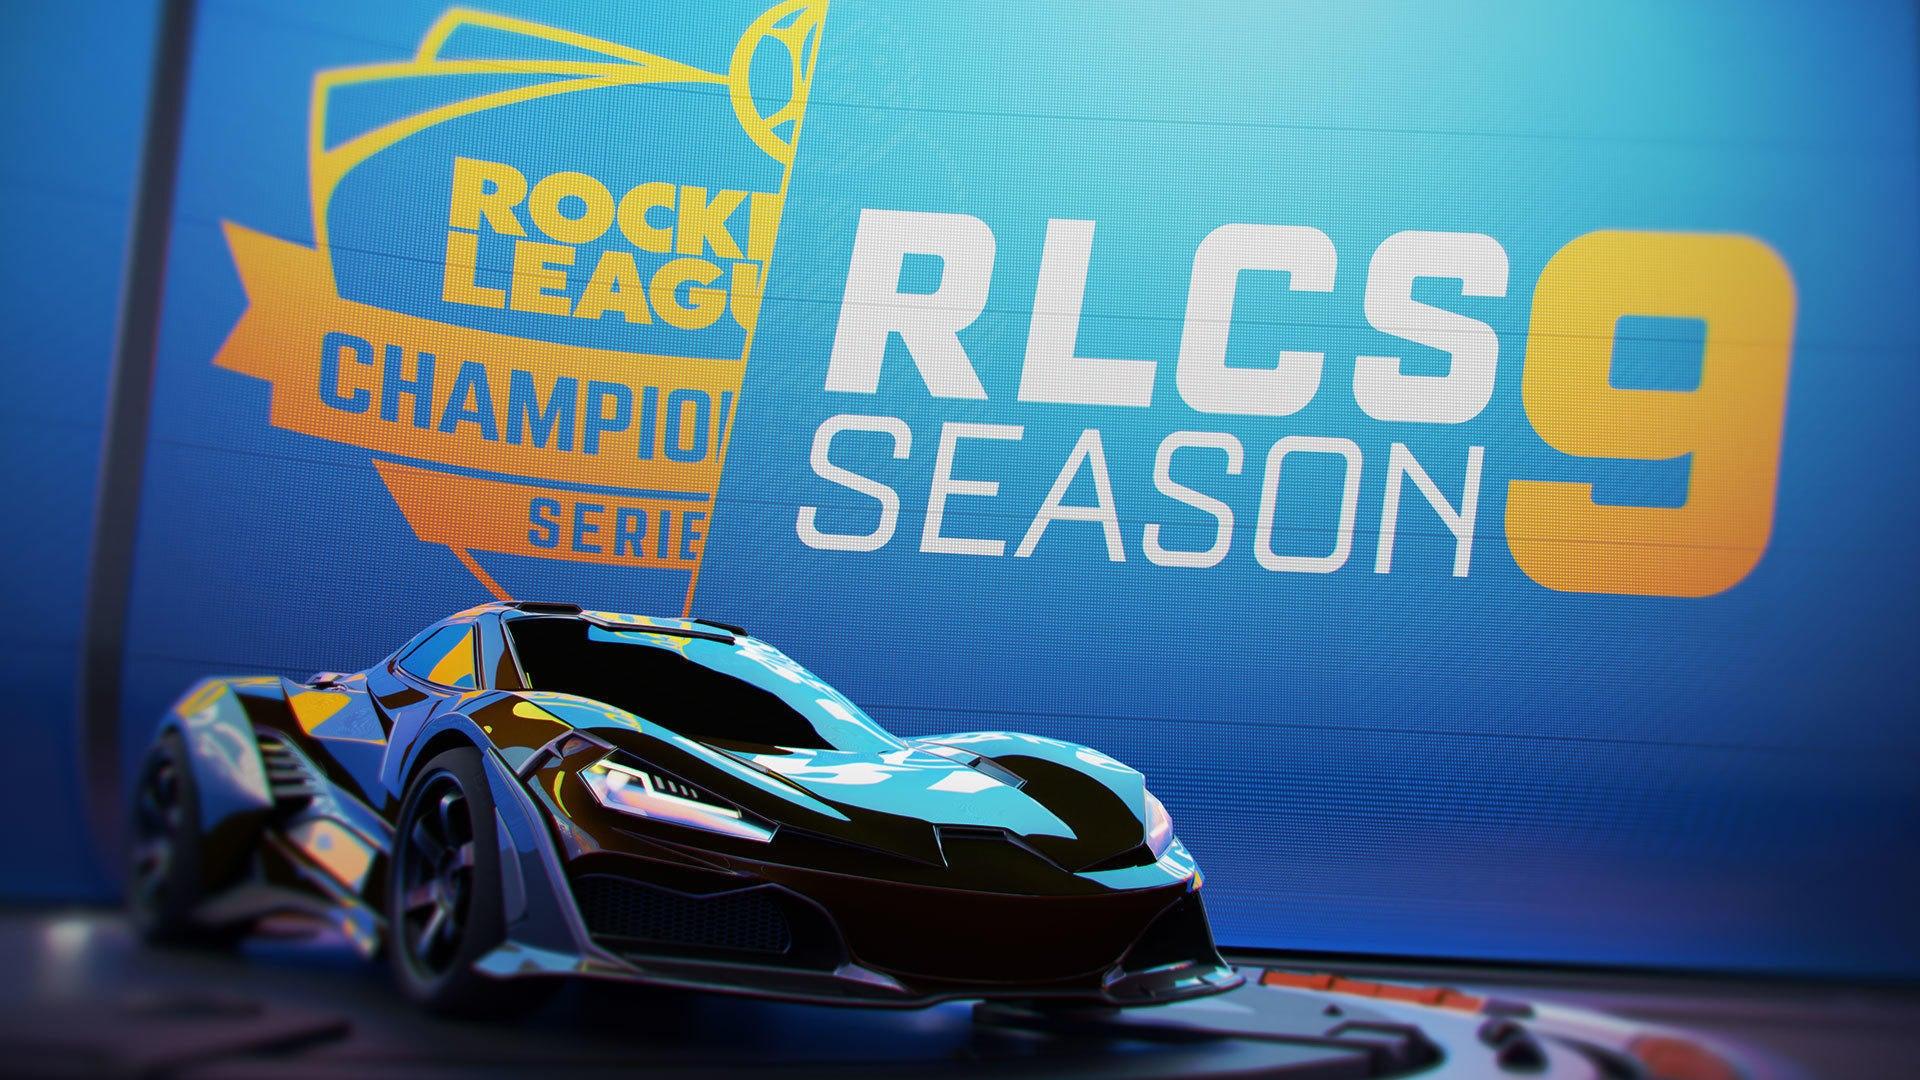 Important Rocket League Esports Update Image